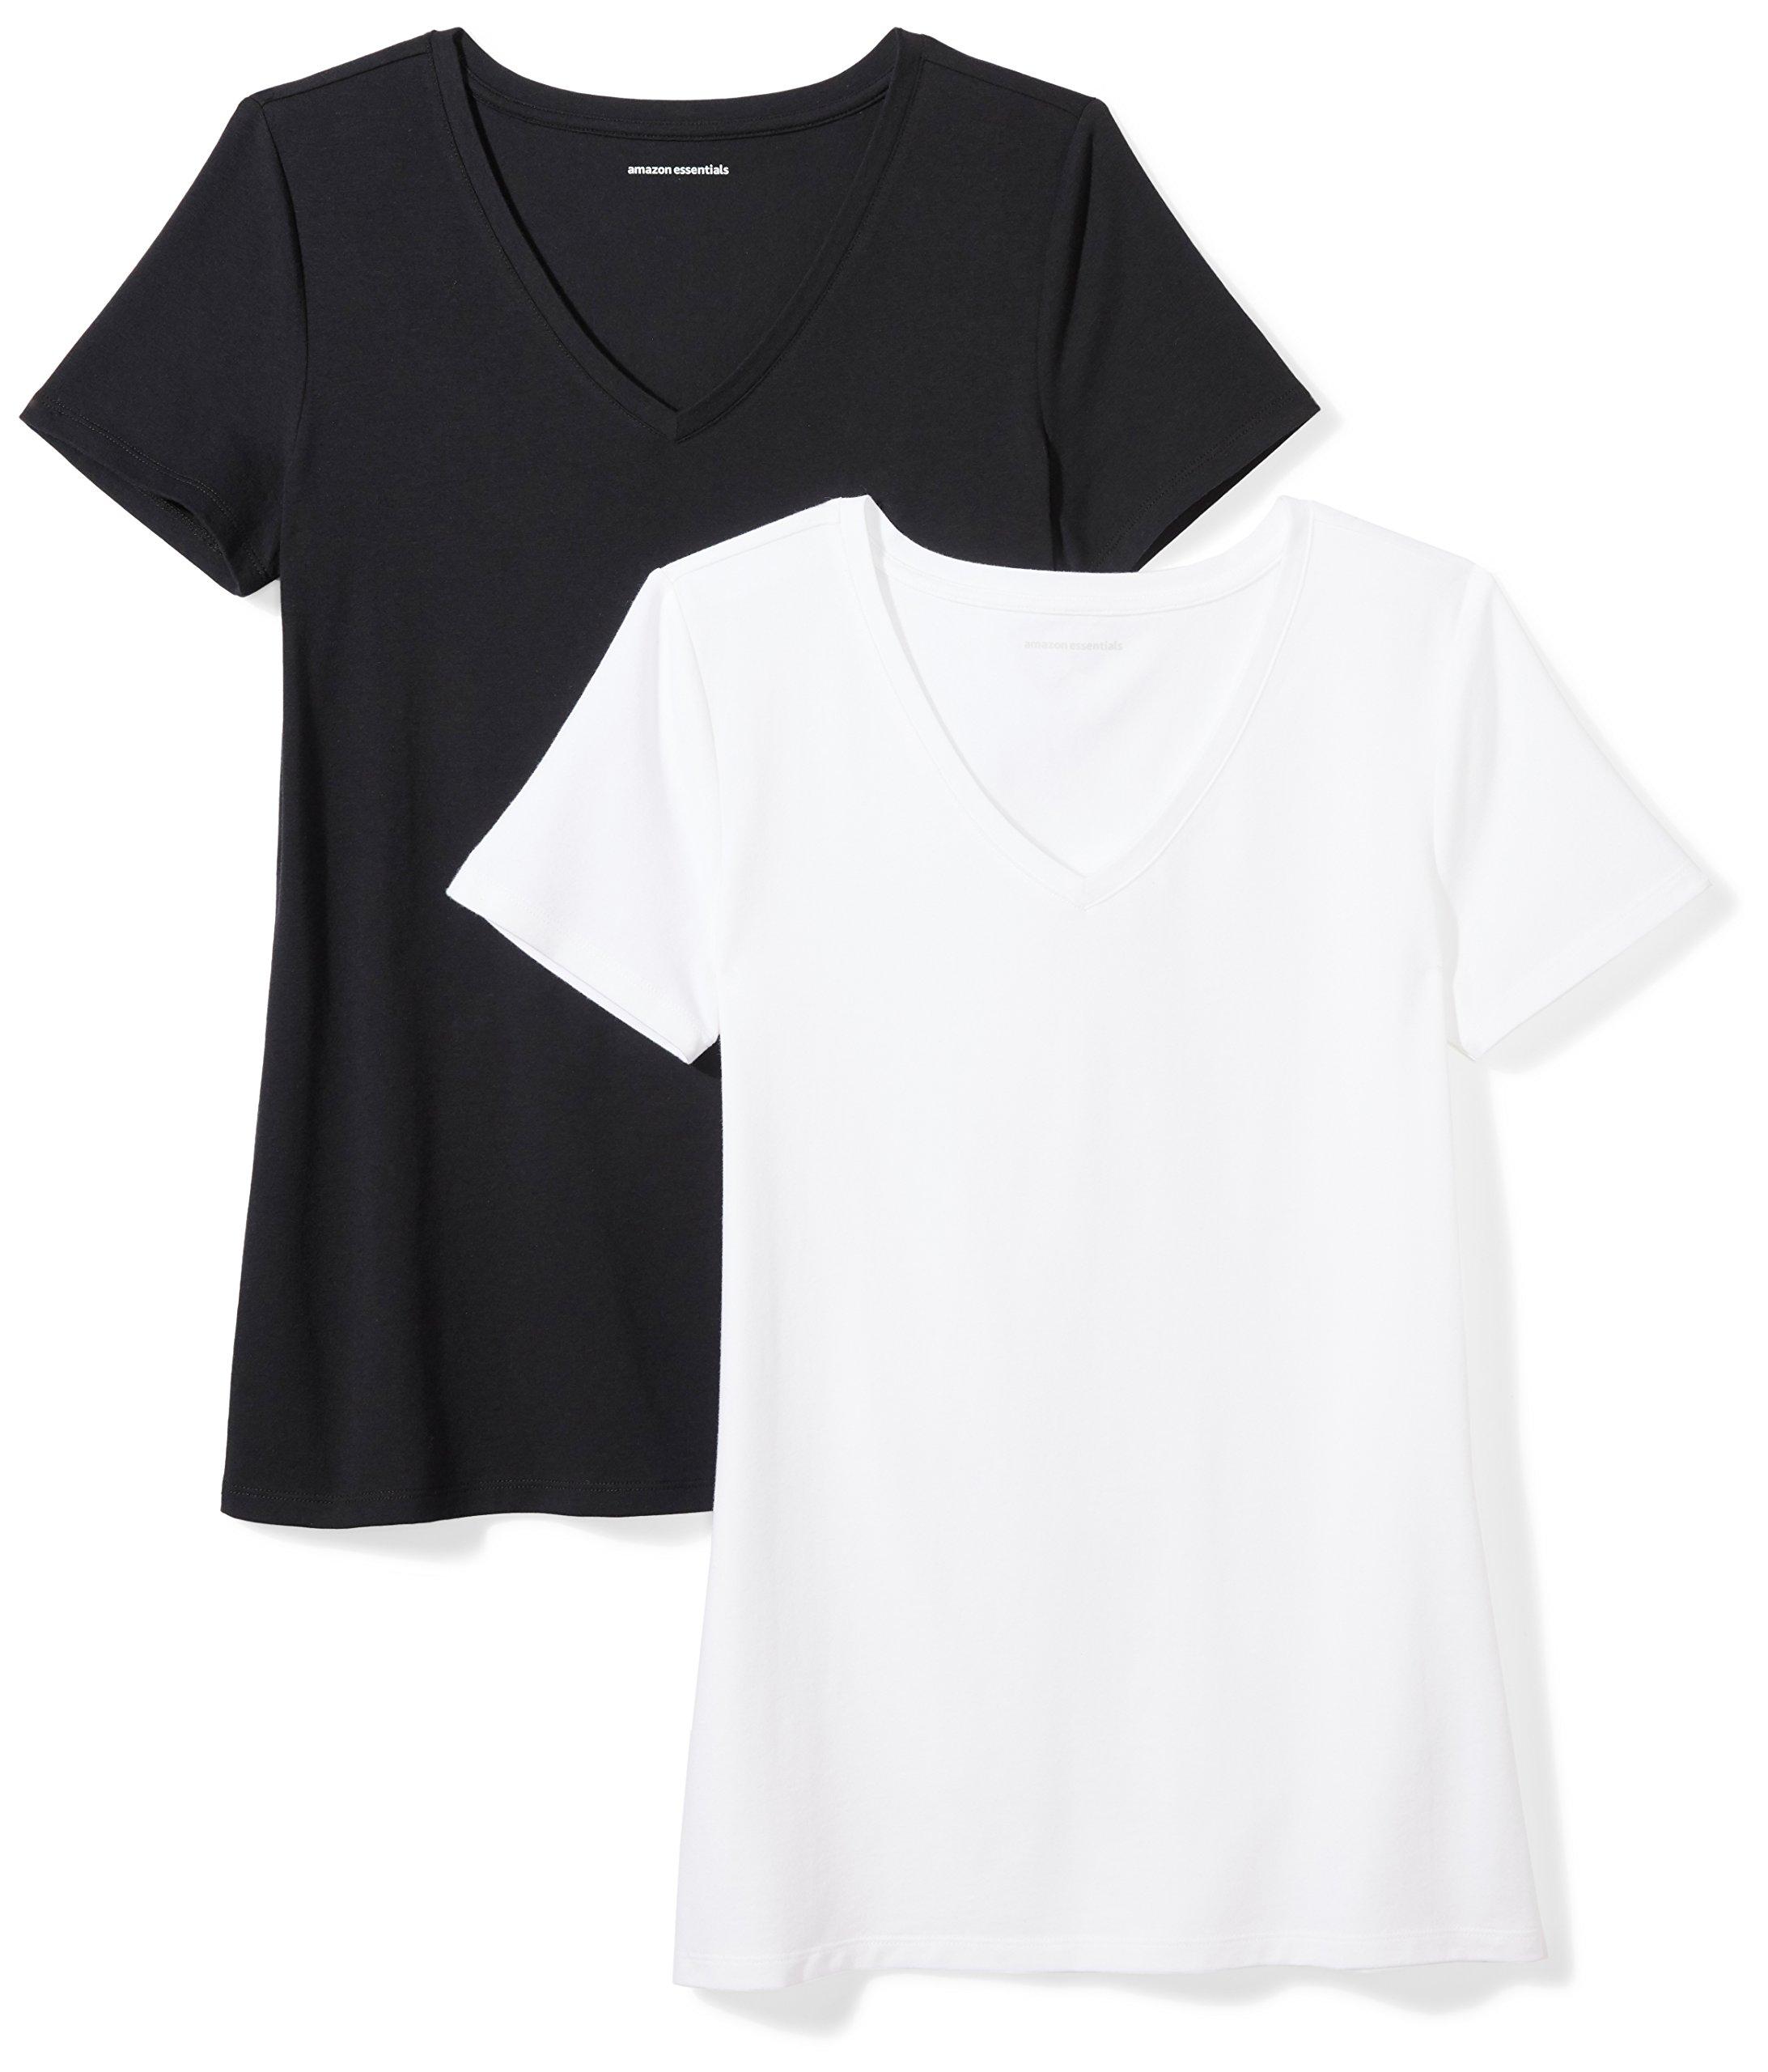 Amazon Essentials Women's 2-Pack Classic-Fit Short-Sleeve V-Neck T-Shirt, Black/White, Medium by Amazon Essentials